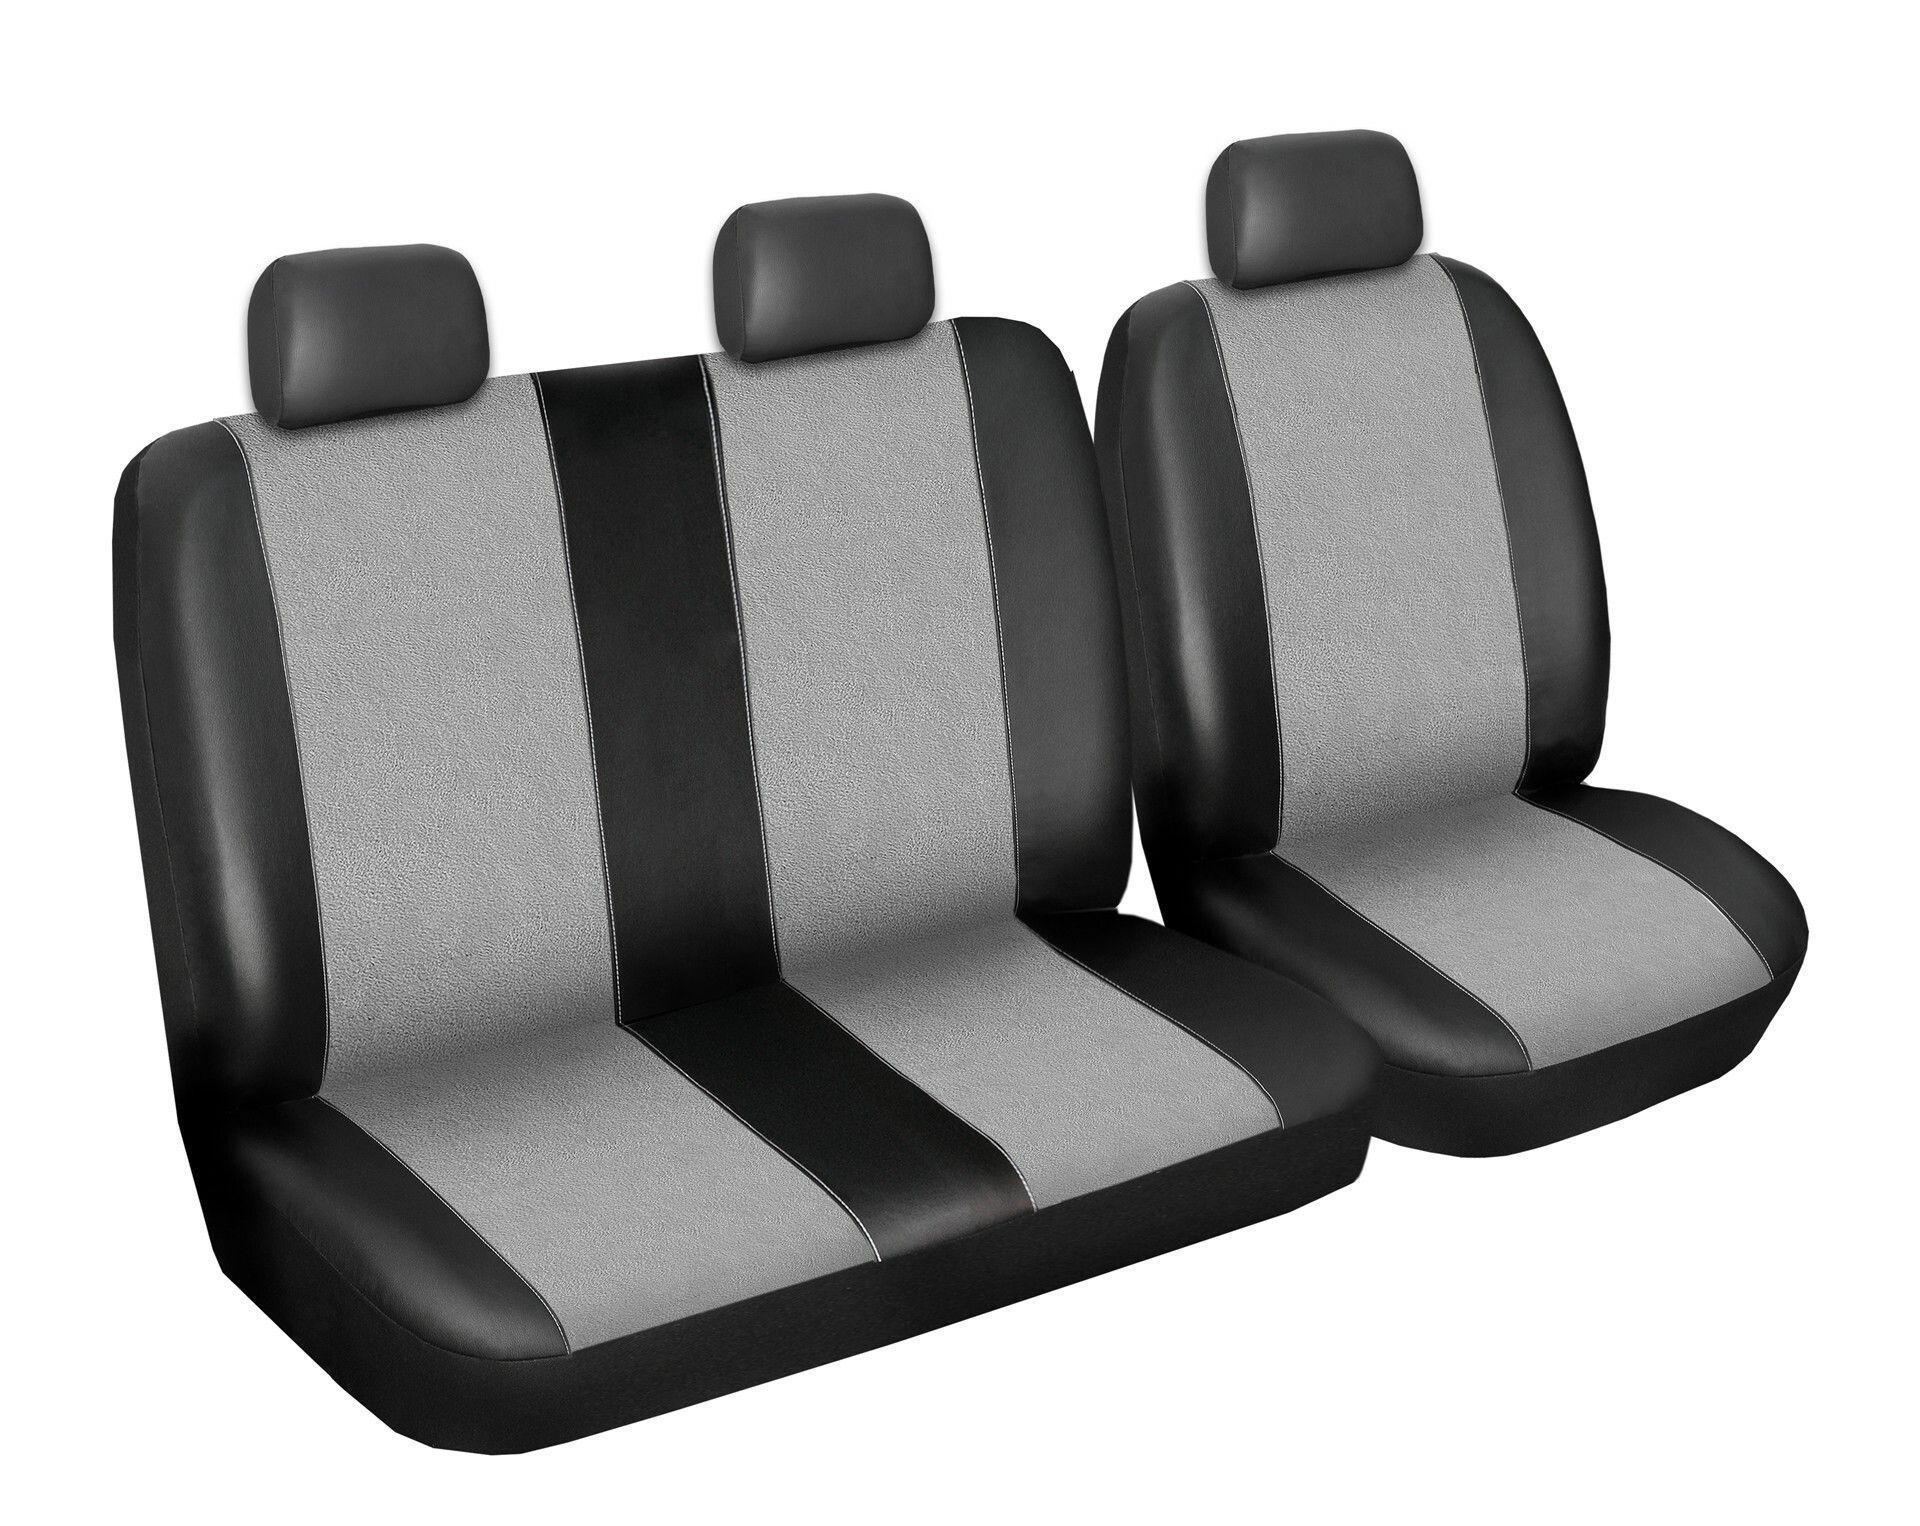 Autopotahy Volkswagen LT, 3 místný, do r. 2006, Eco kůže + alcantara šedé